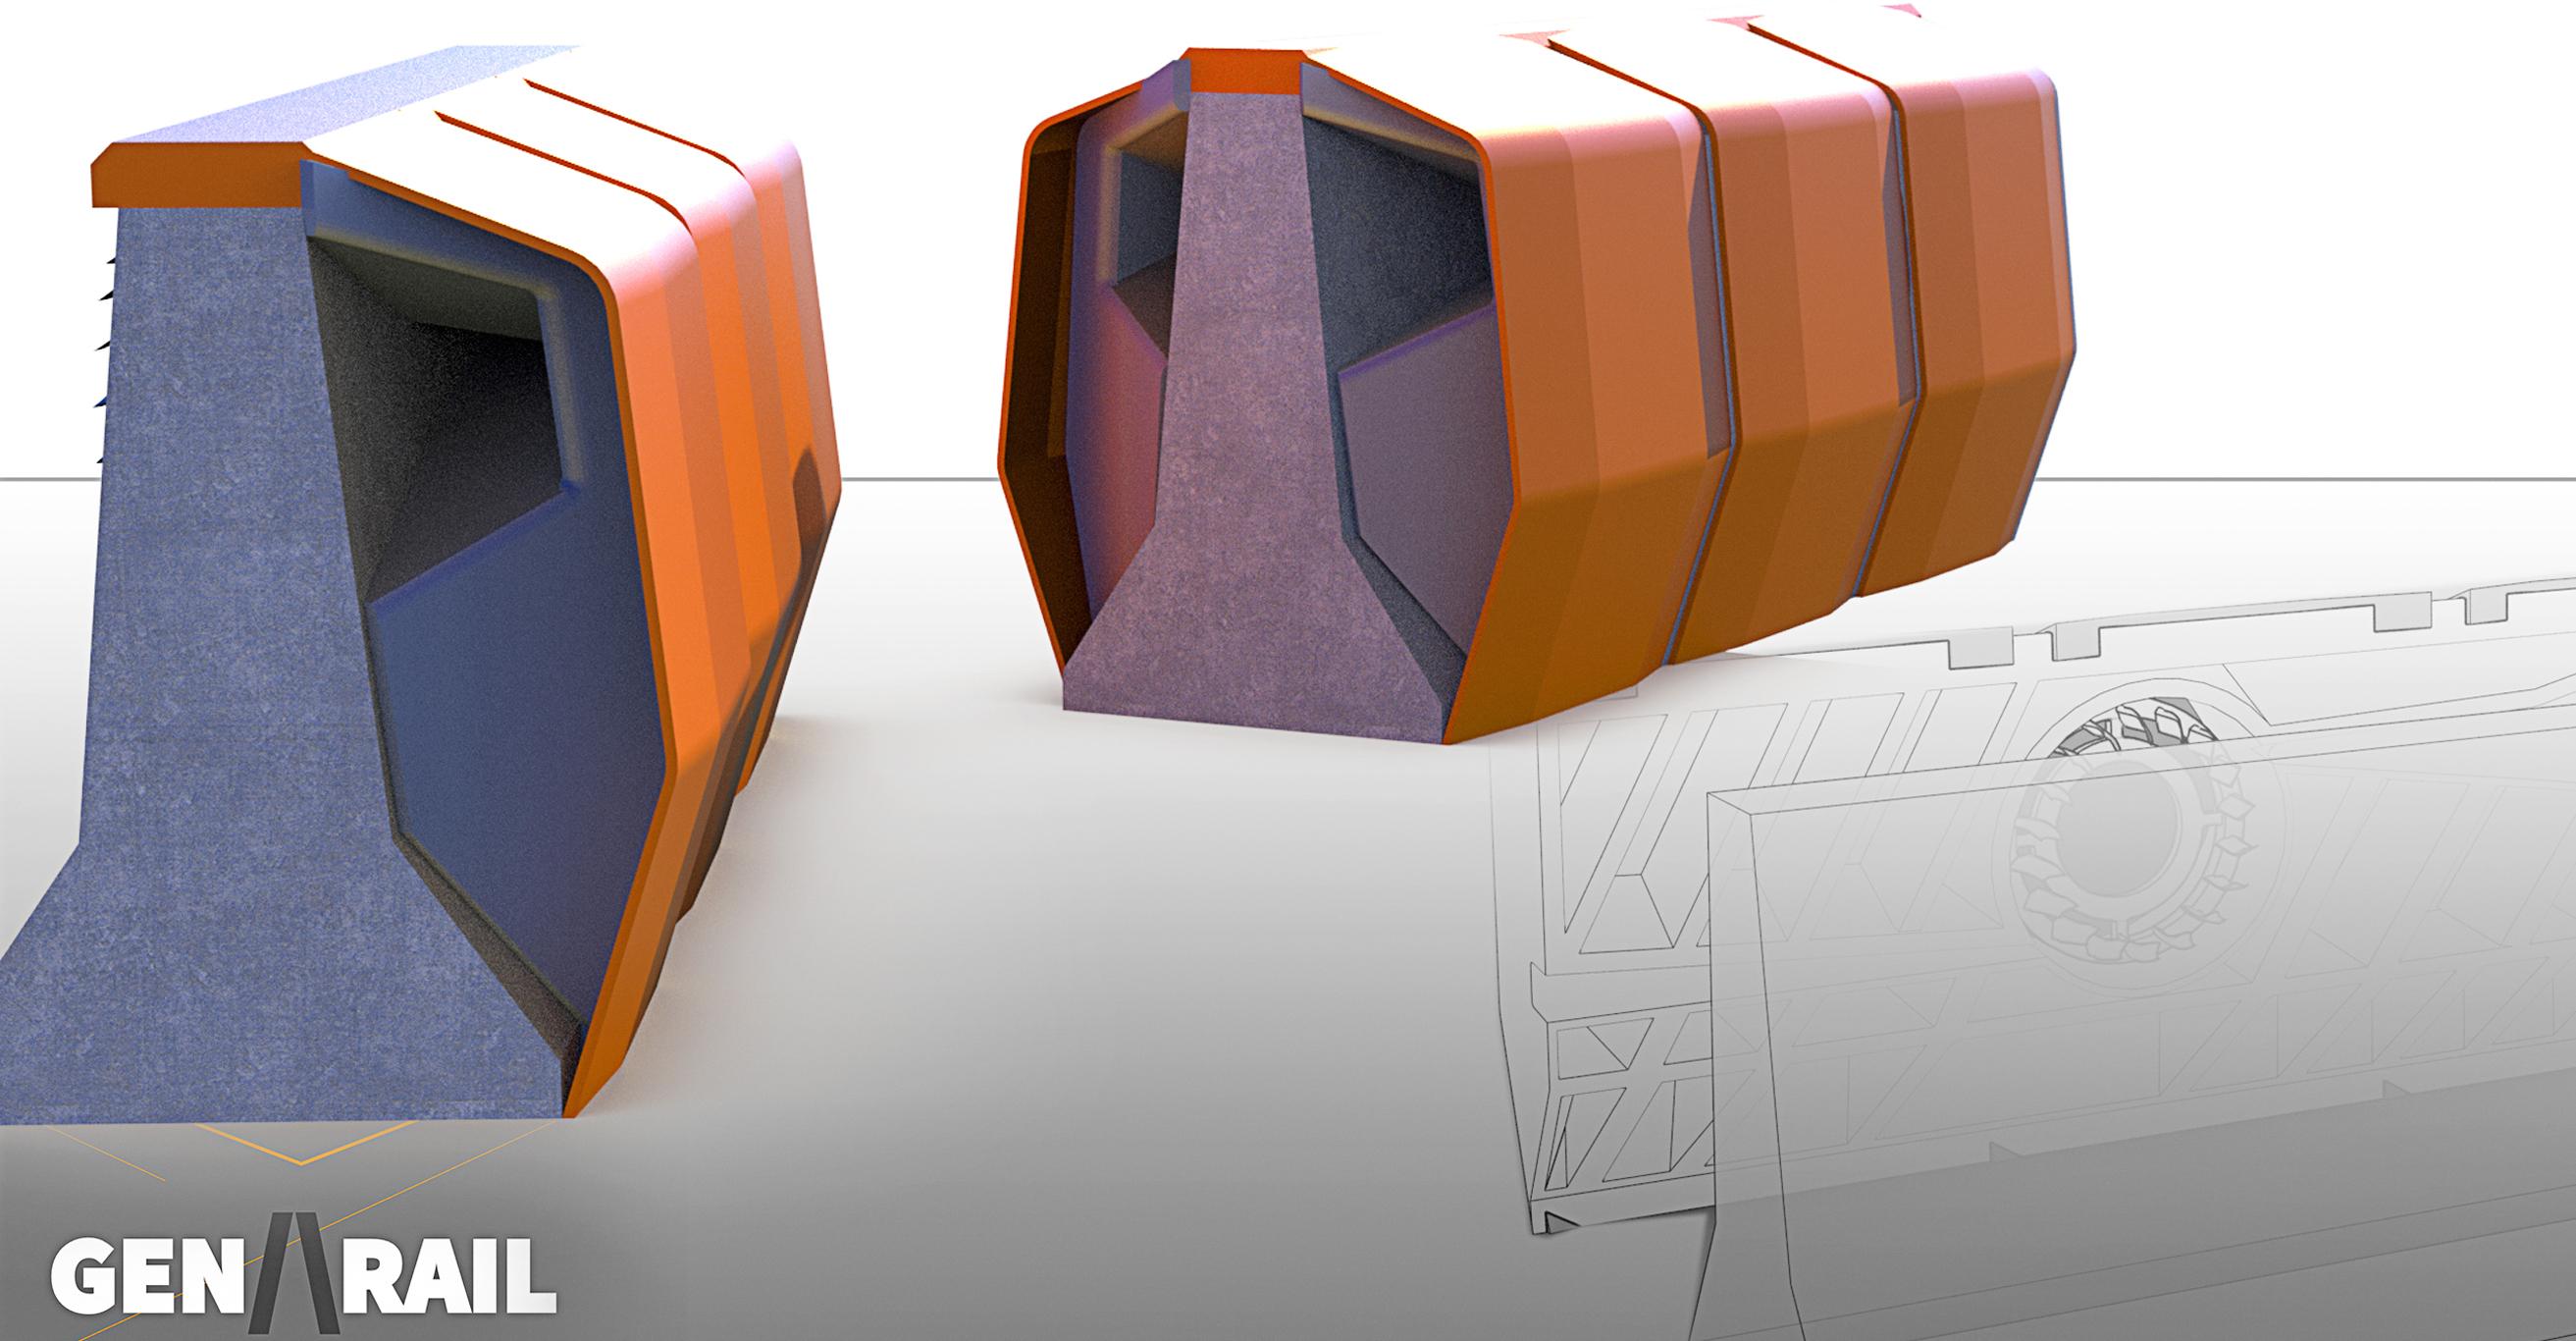 Gen-Rail: A Modular Freeway Energy Generation Device